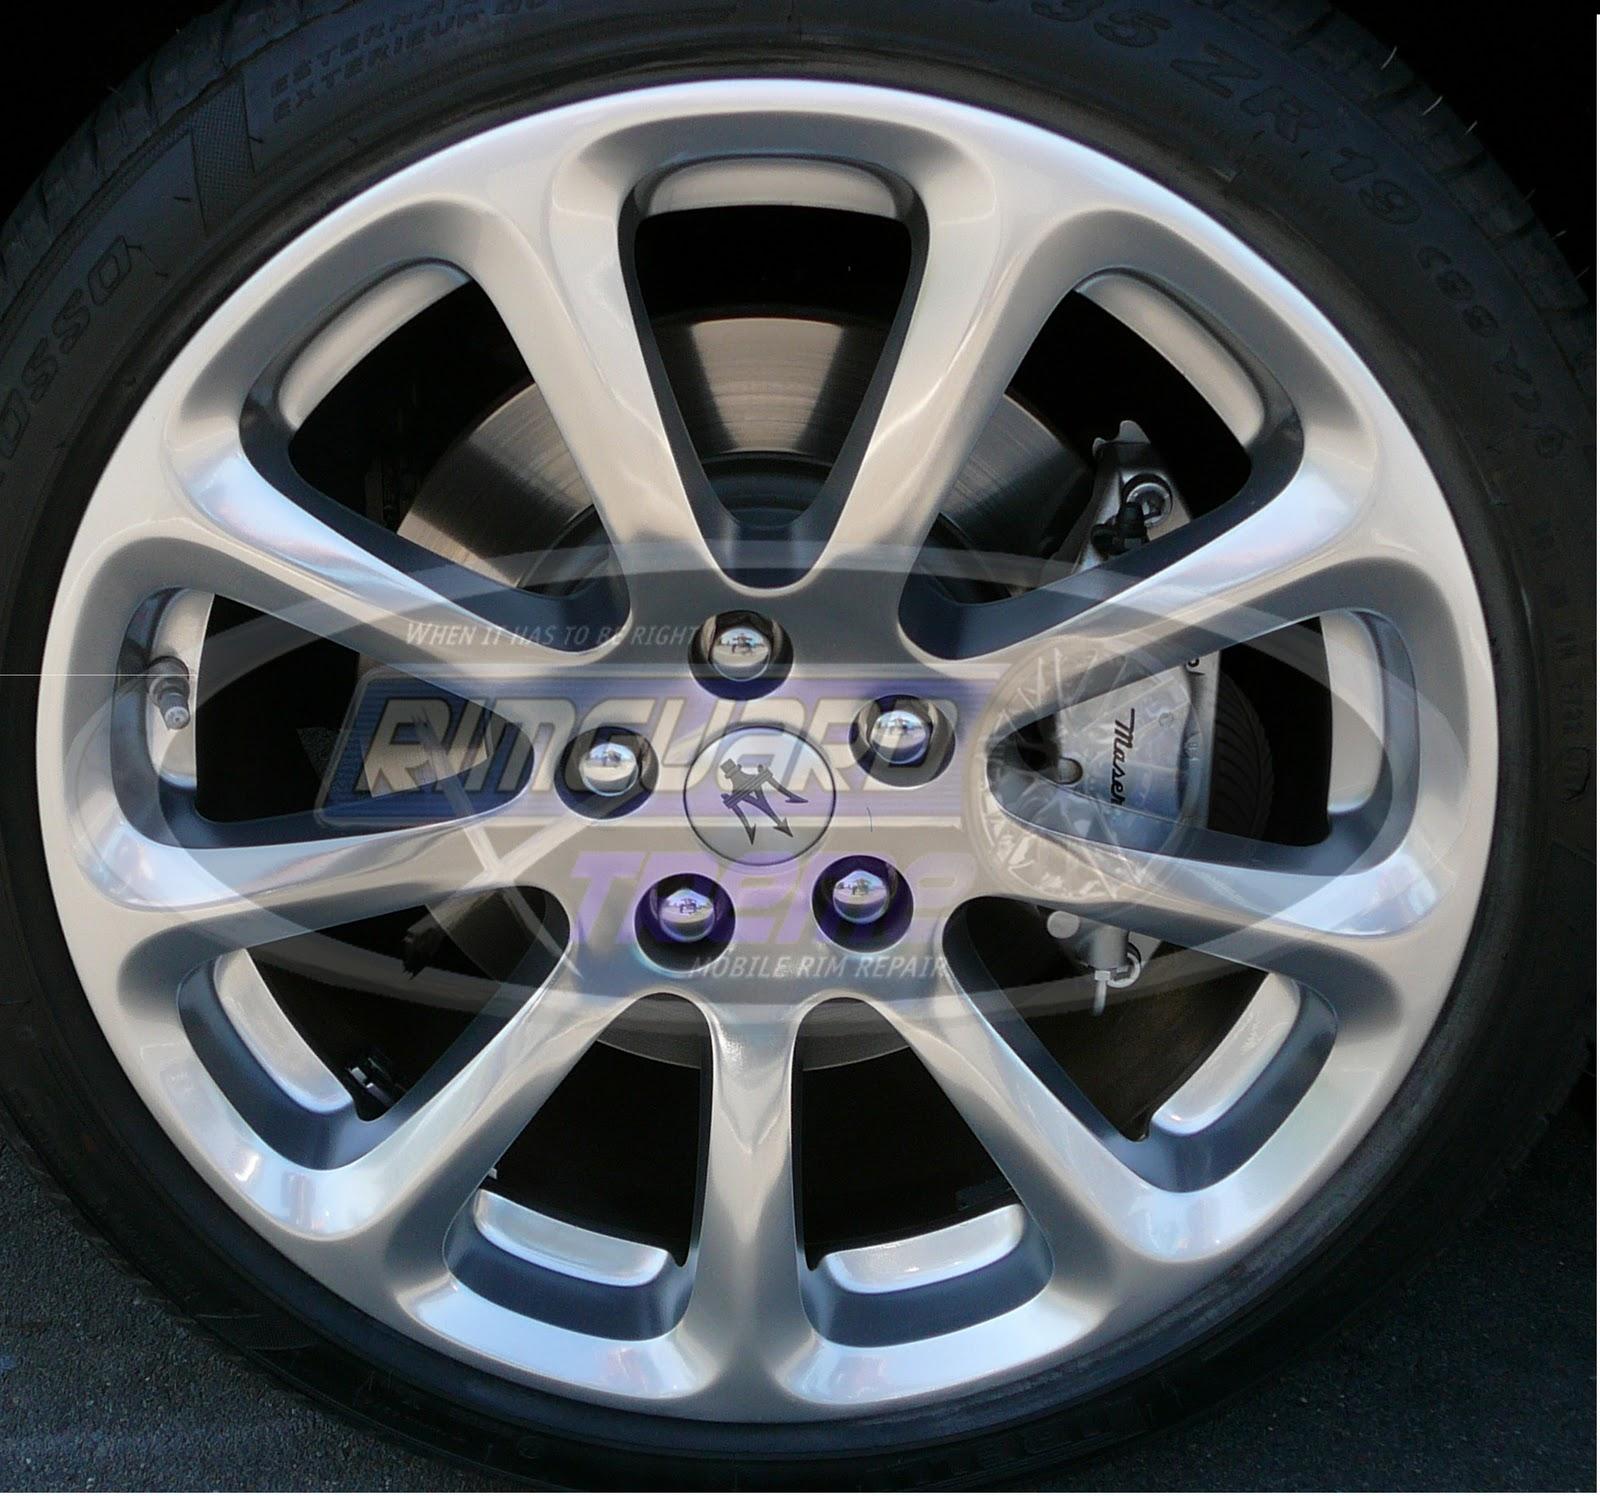 Alloy Wheel Rim Repair Free Shipping & Mobile Alloy Wheel Rim